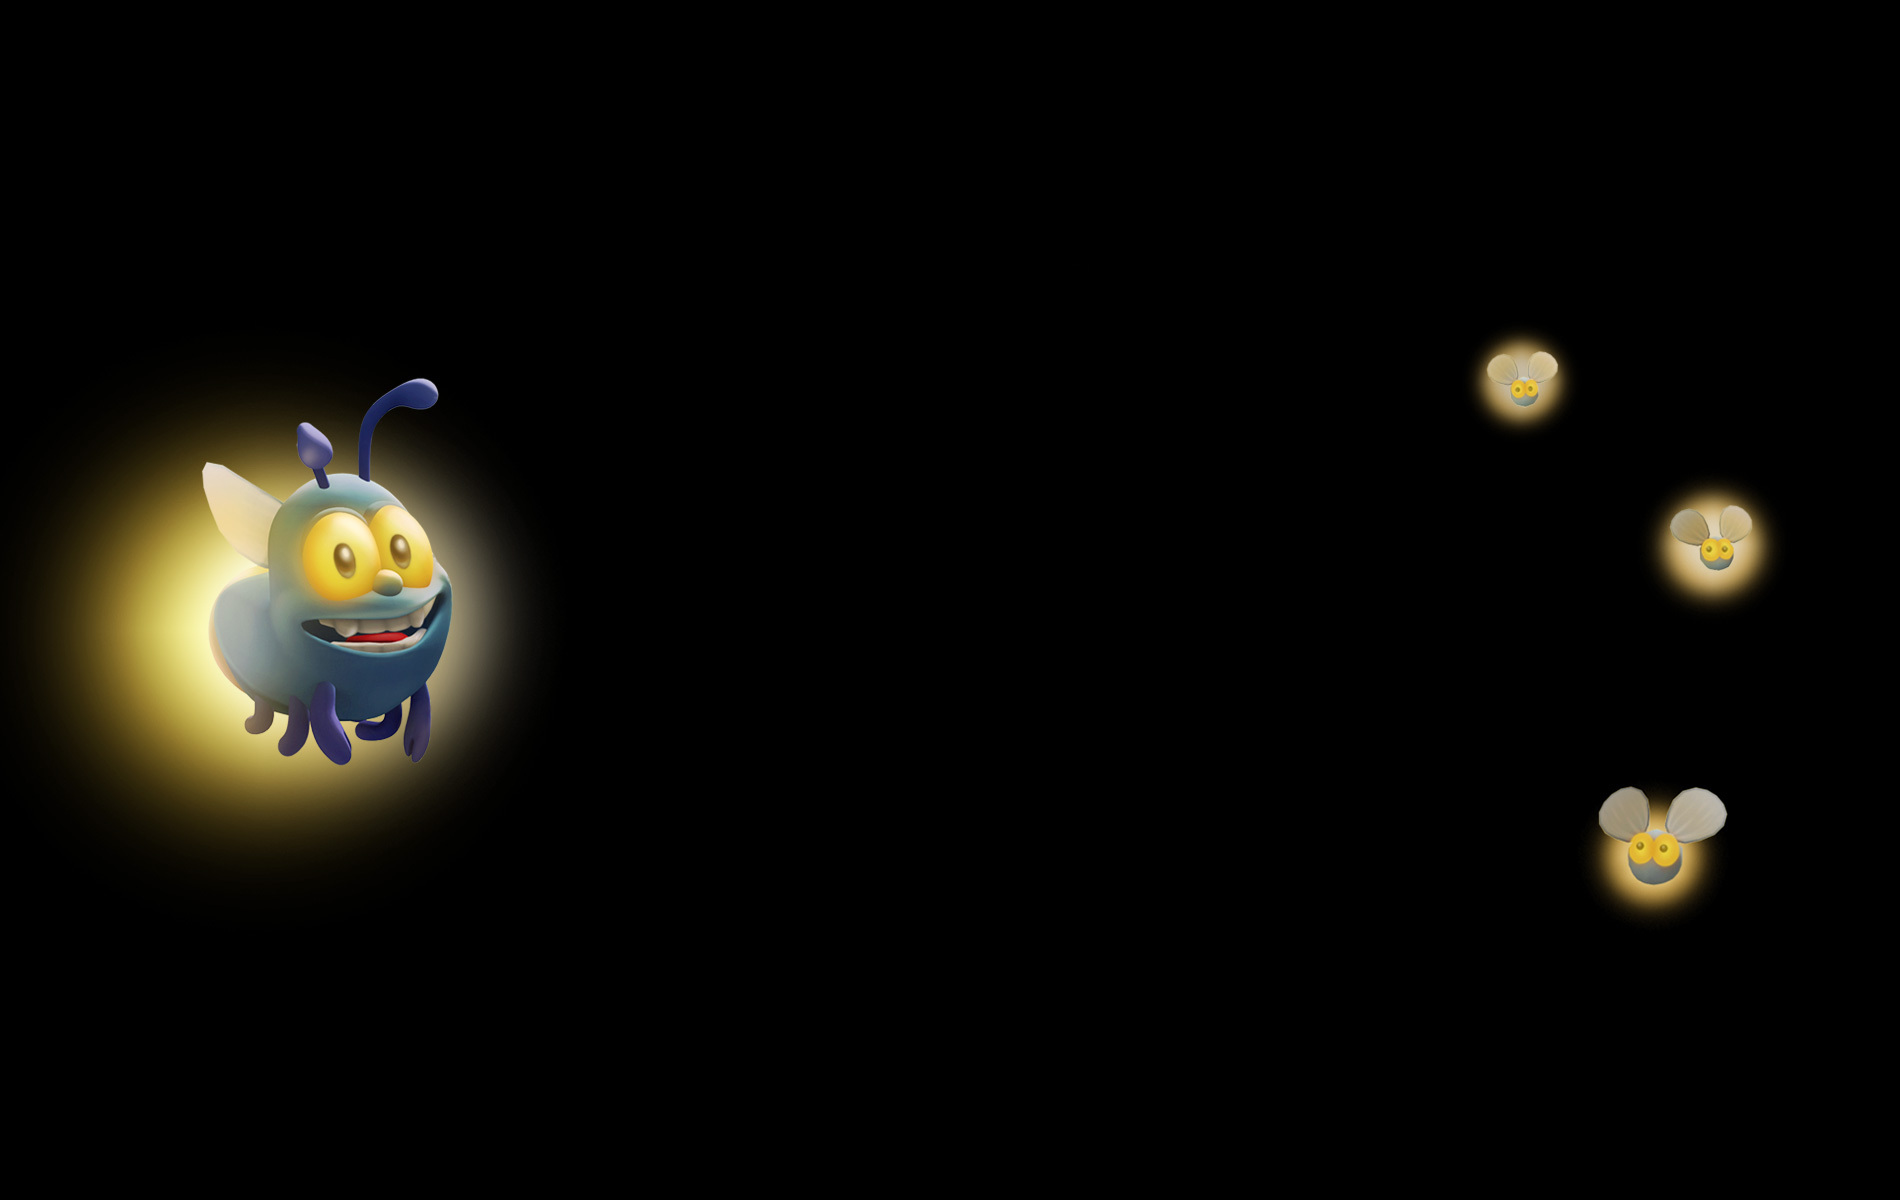 videospel shiny the firefly wallpaper